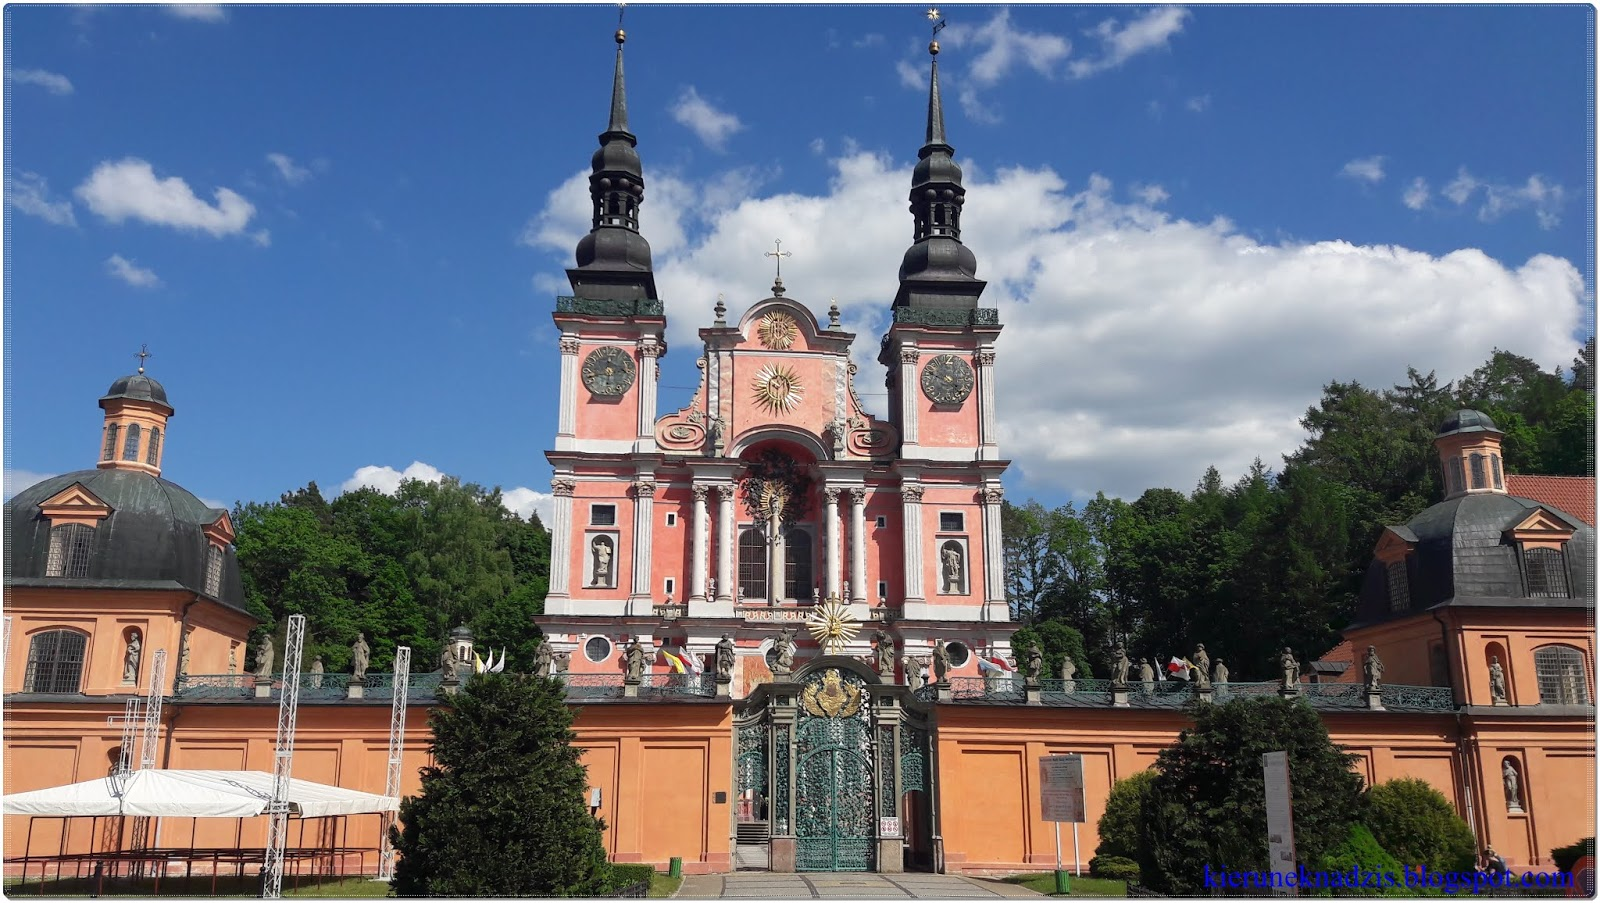 Kierunek Na Dziś Cudowne Sanktuarium W świętej Lipce